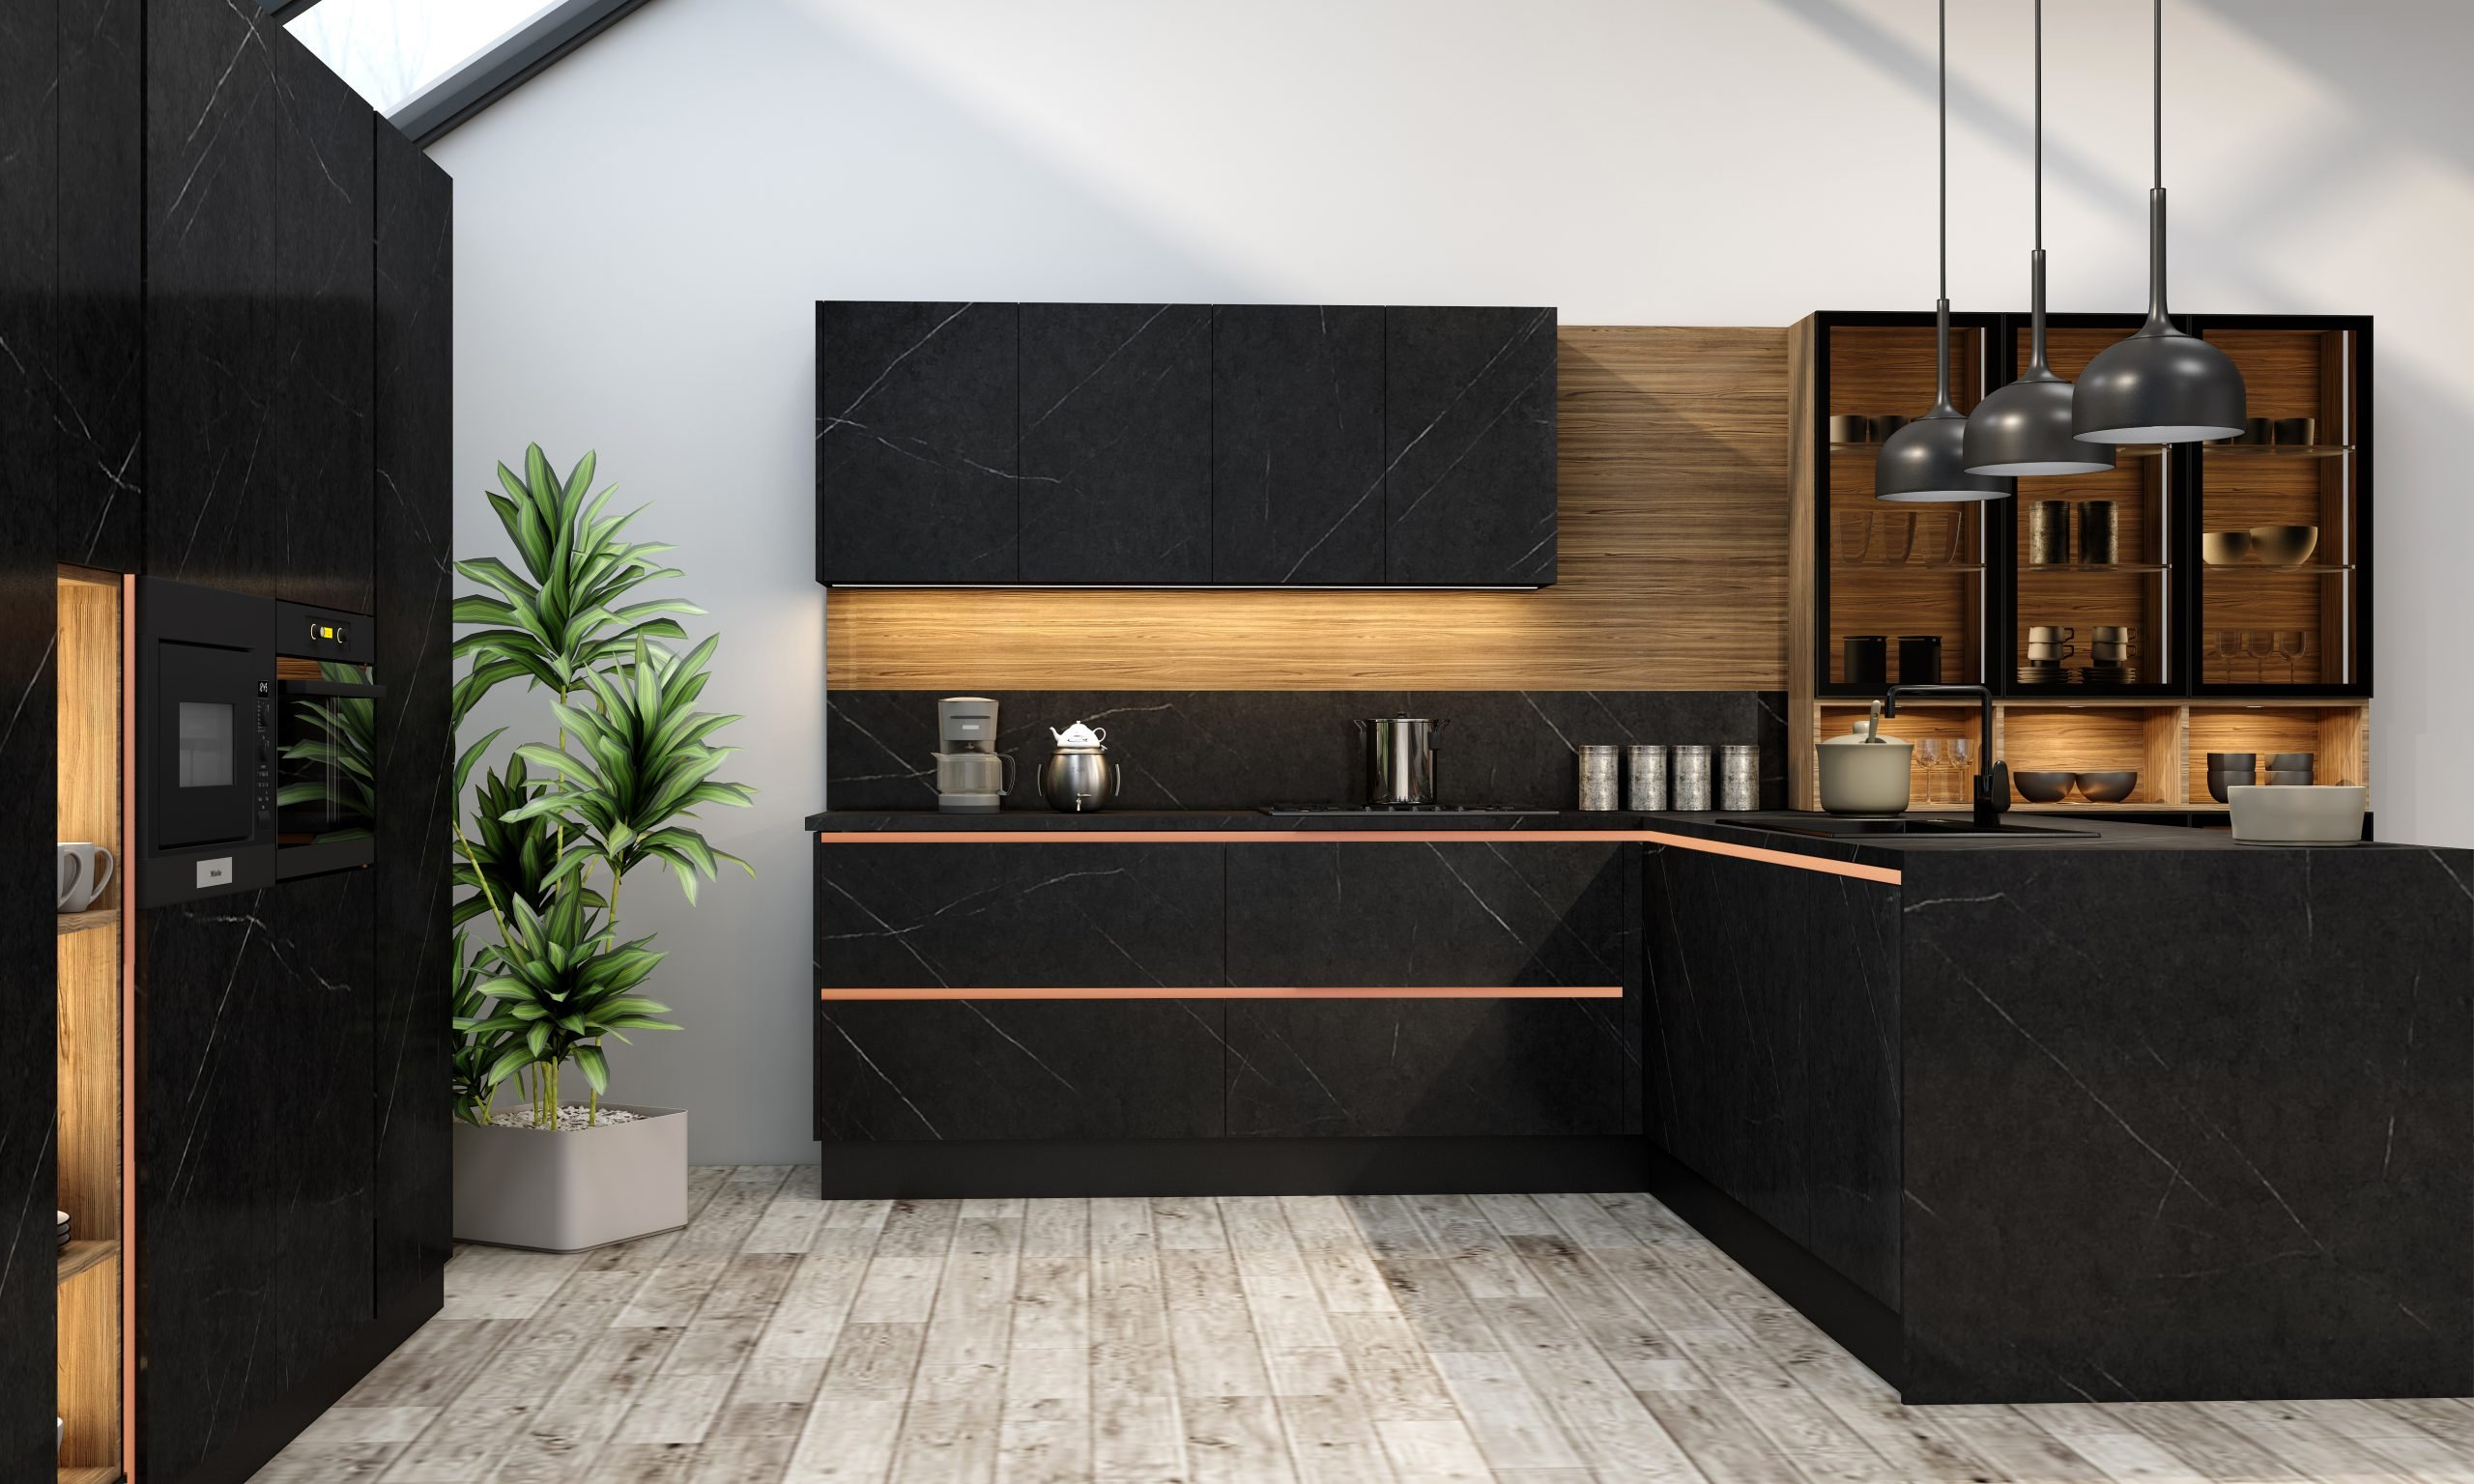 Premiumline Peninsula Kitchen With Gold Handleless Profile in Levanto Black Stone Finish